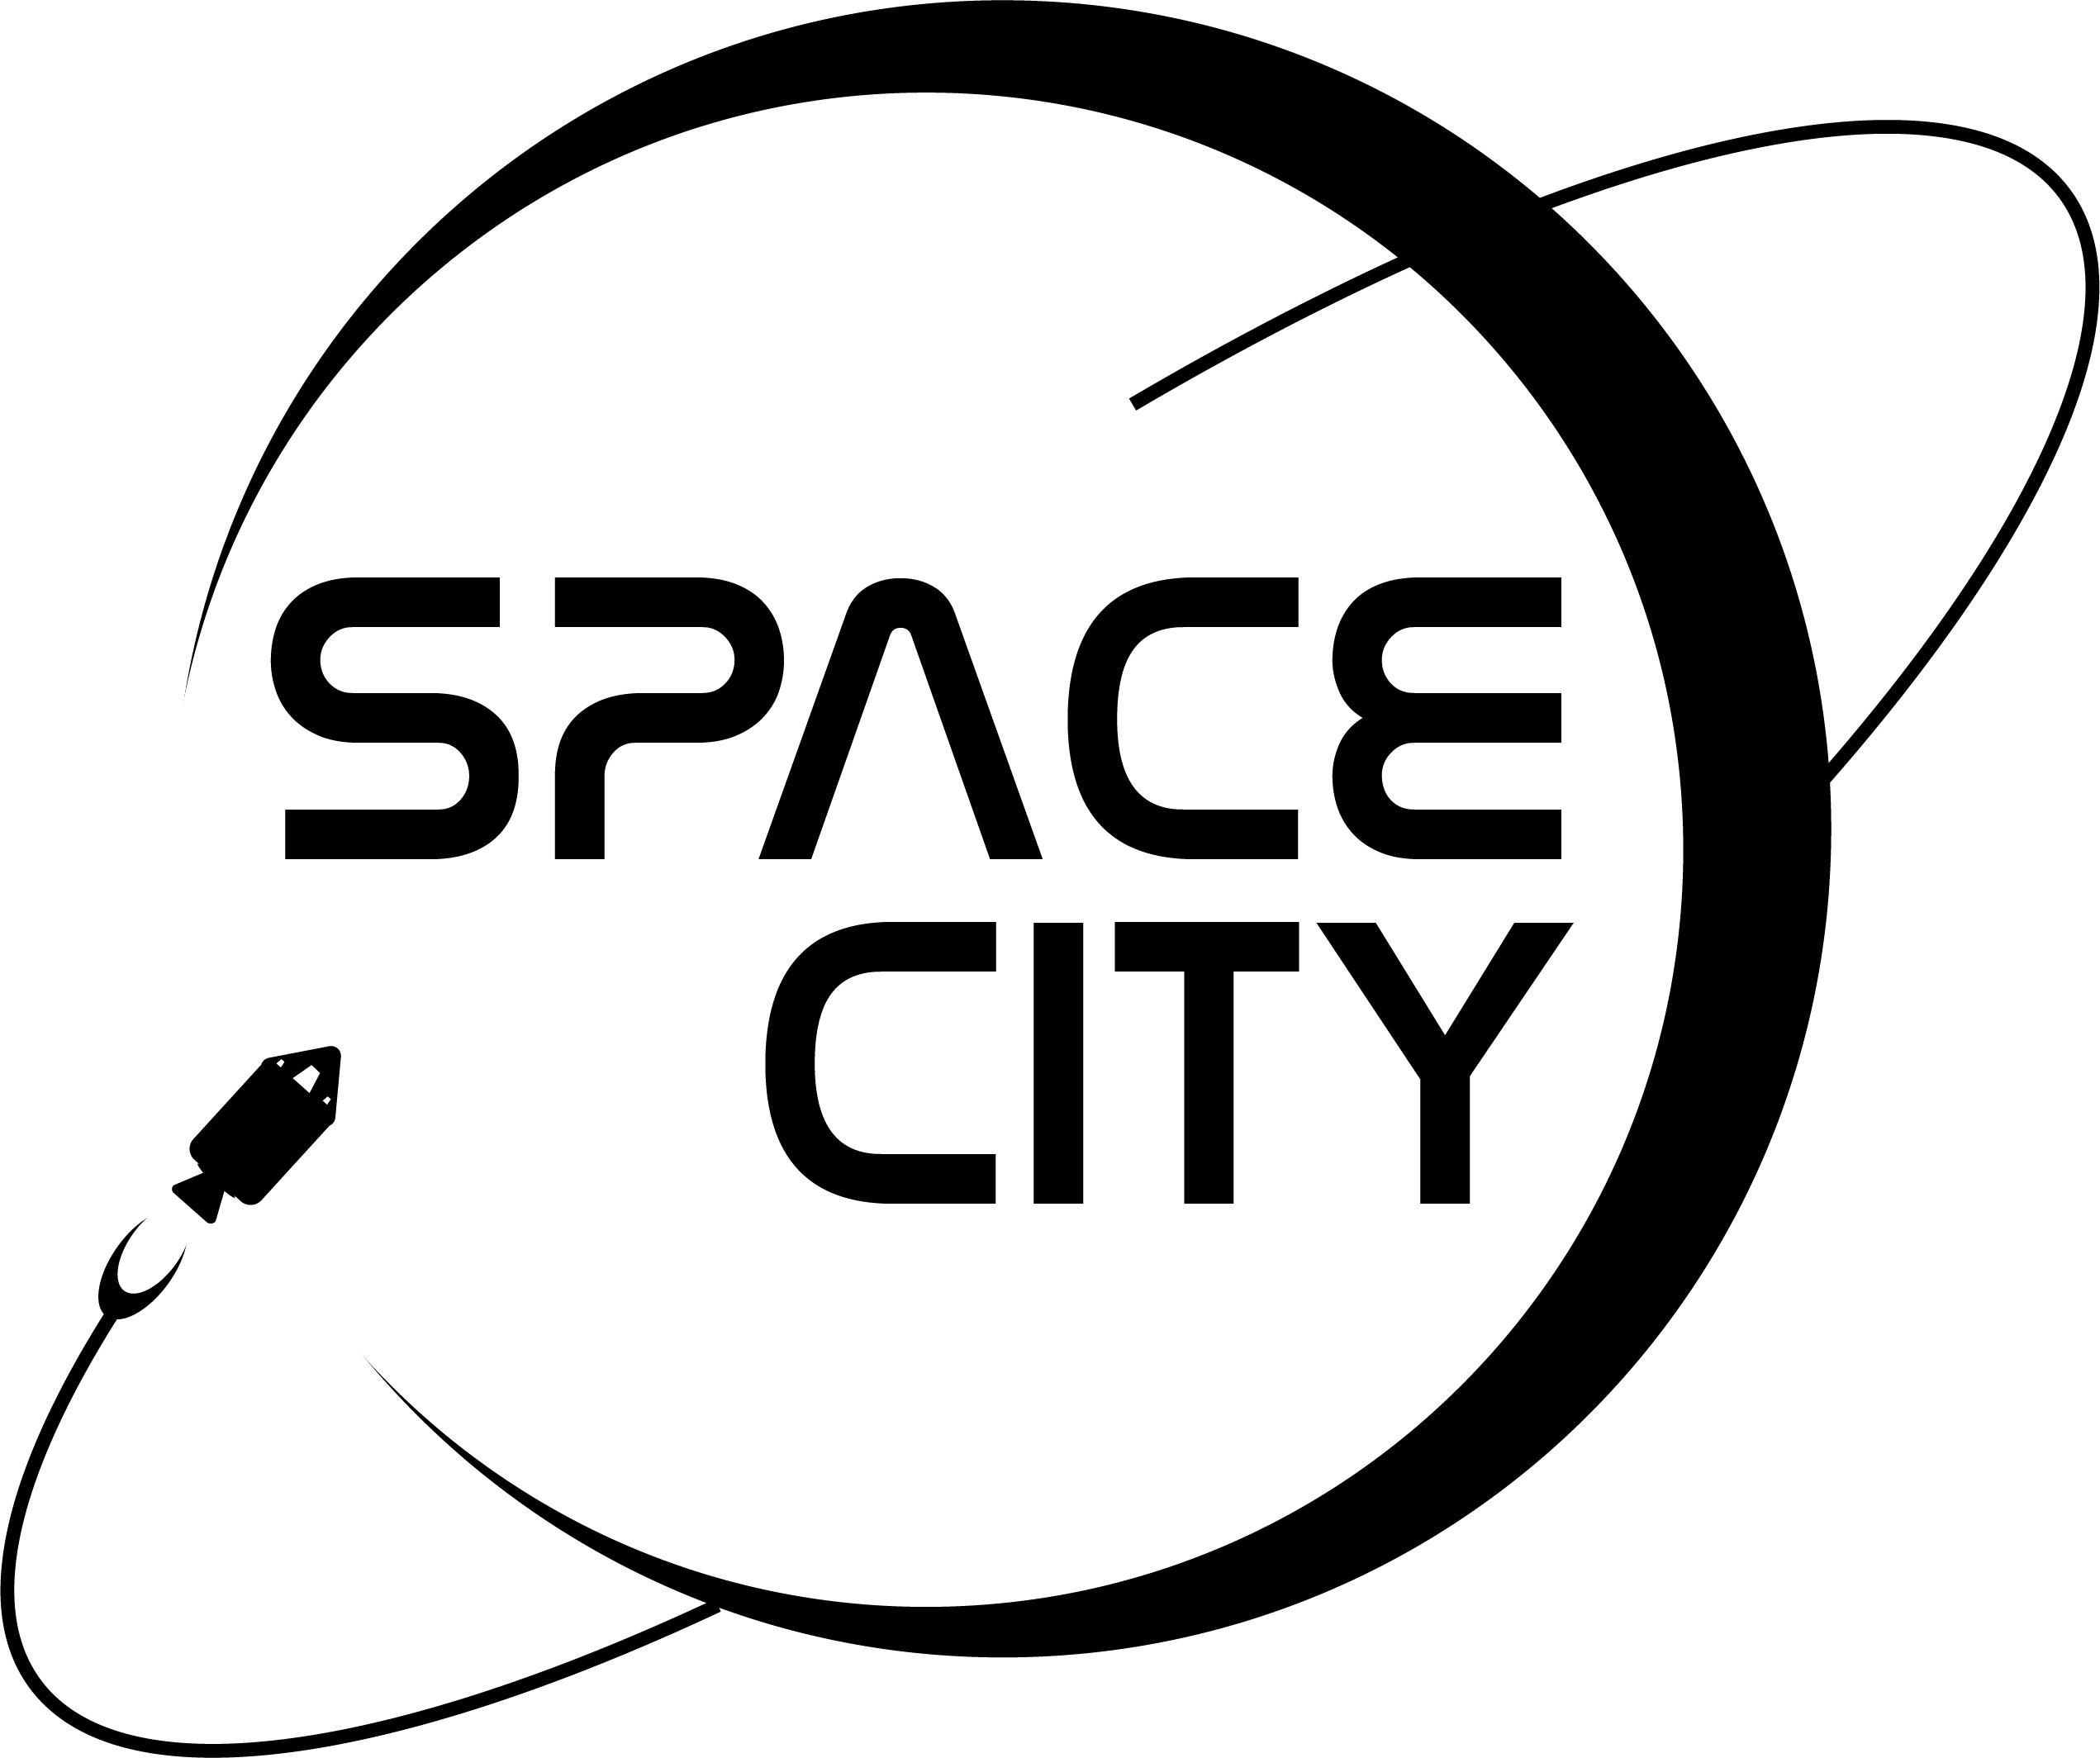 Space City VRC High School League - Invitational